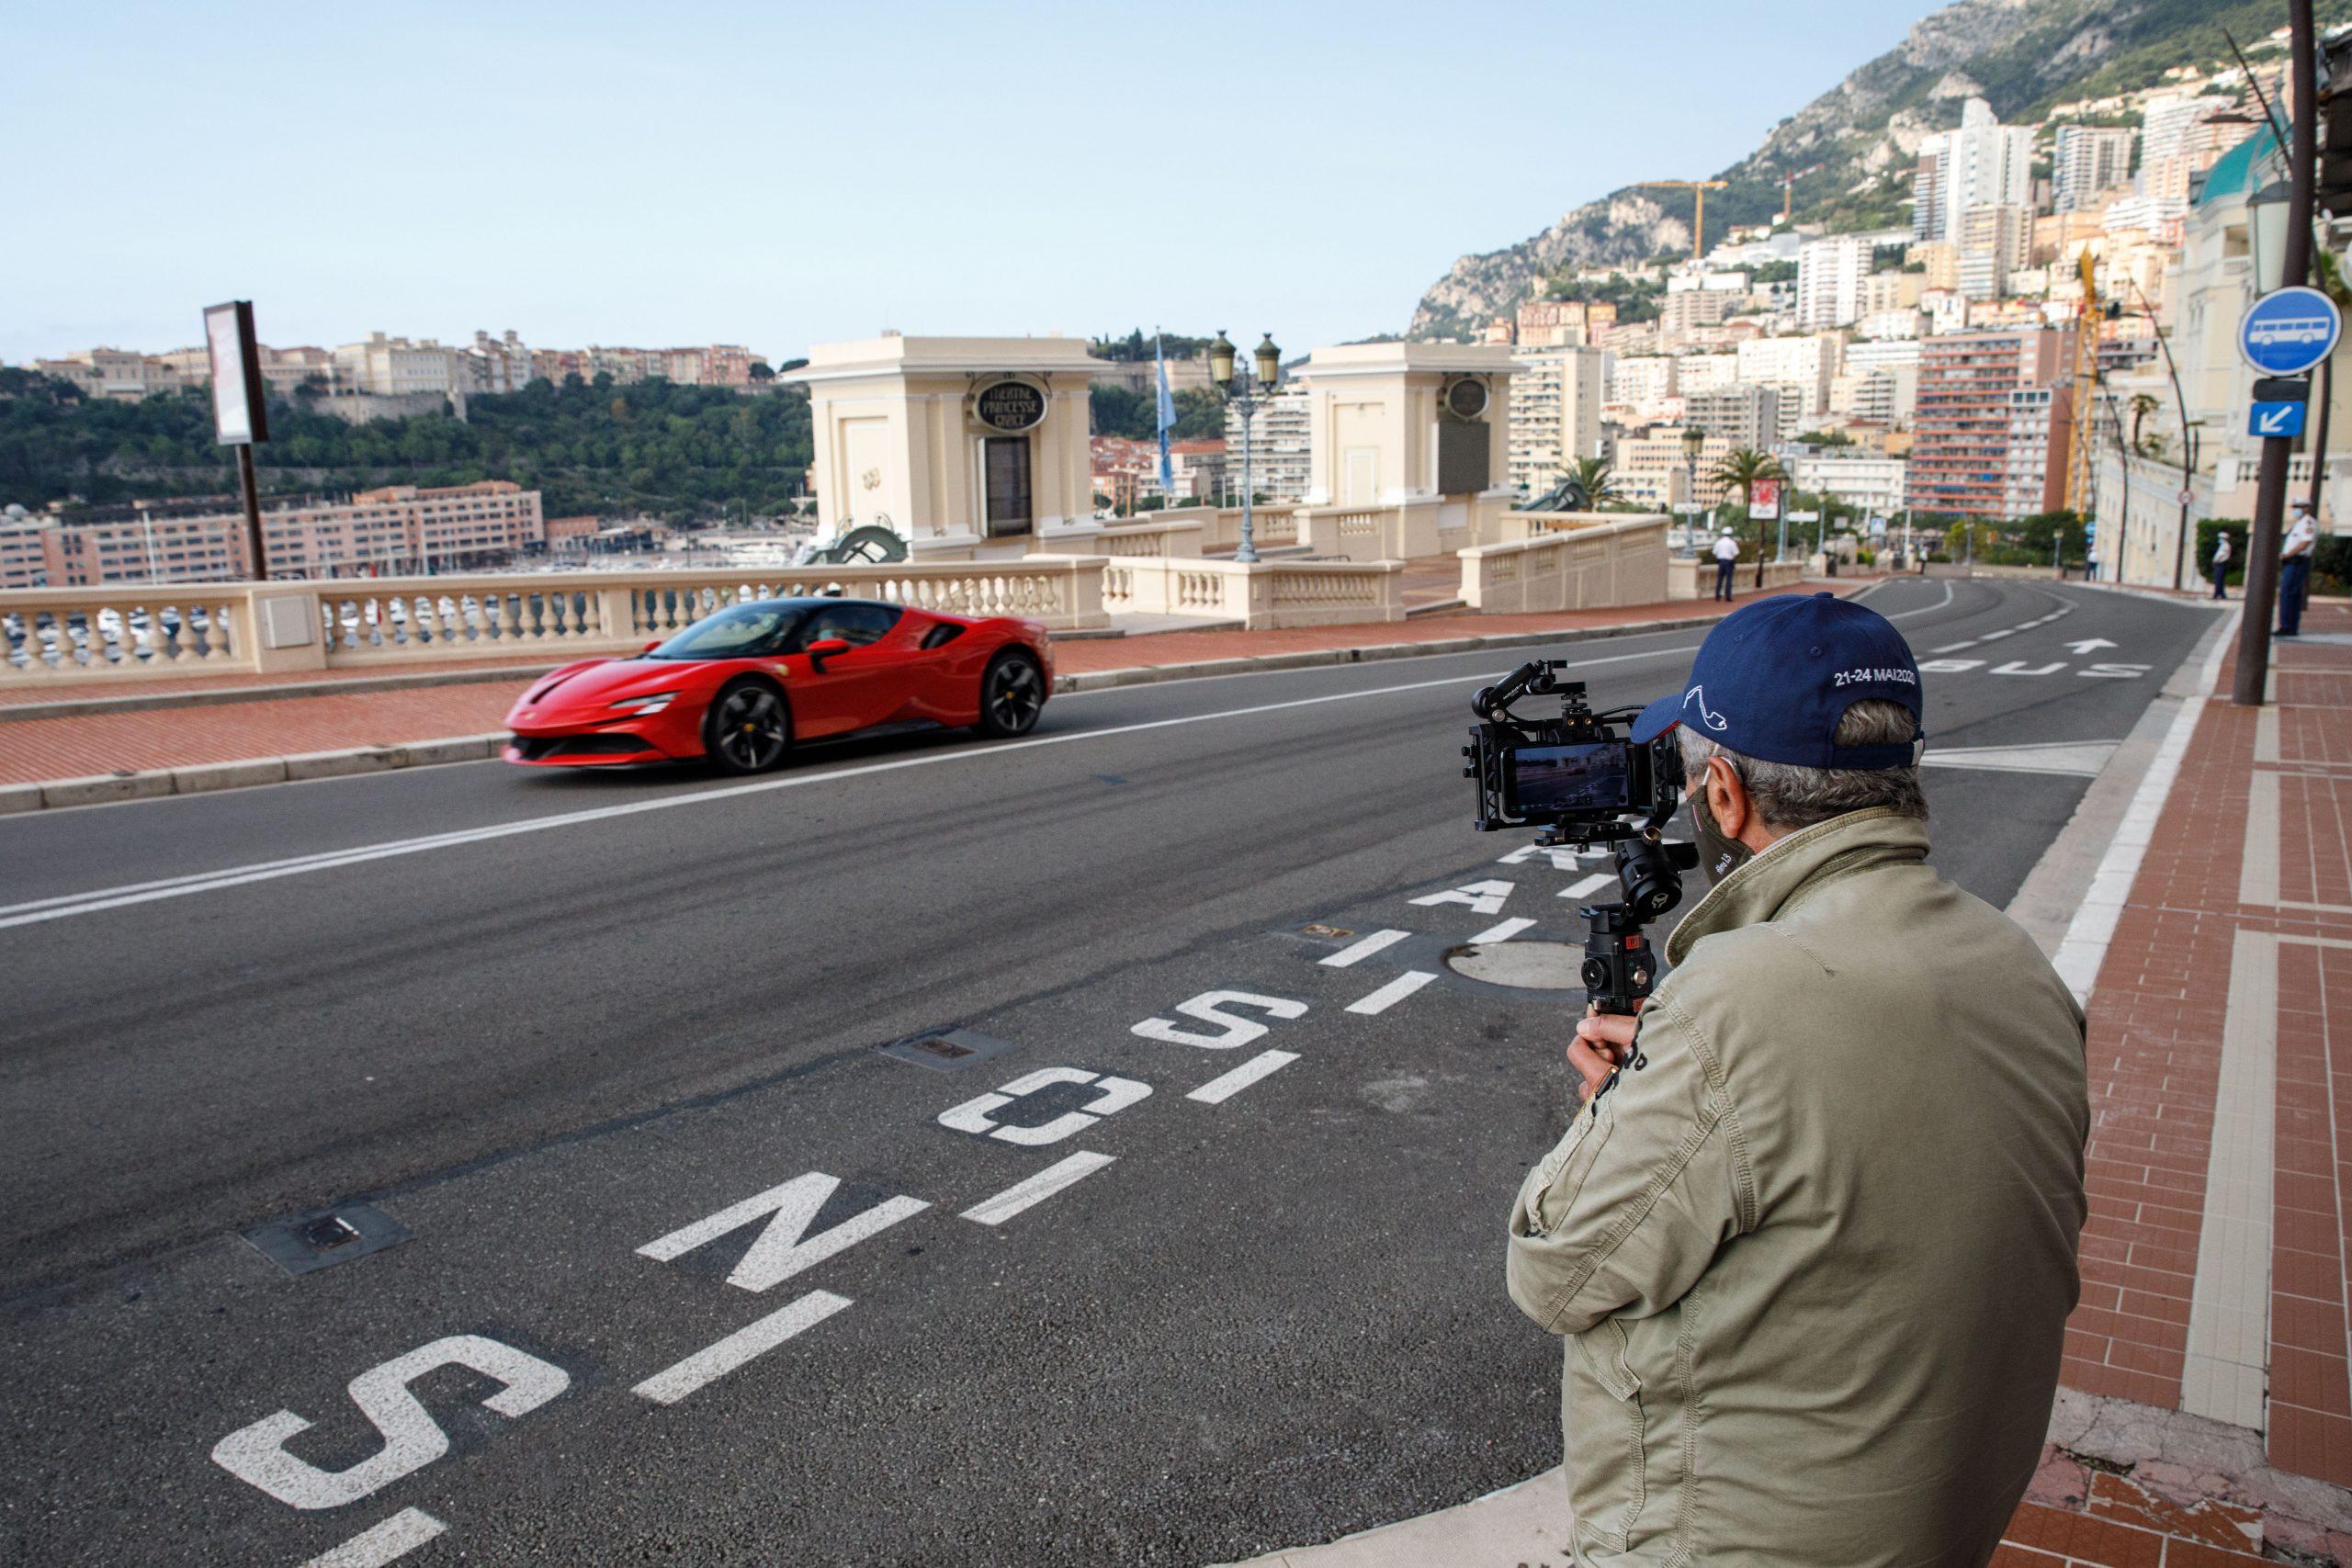 Ferrari_SF90_Stradale_Monaco_film